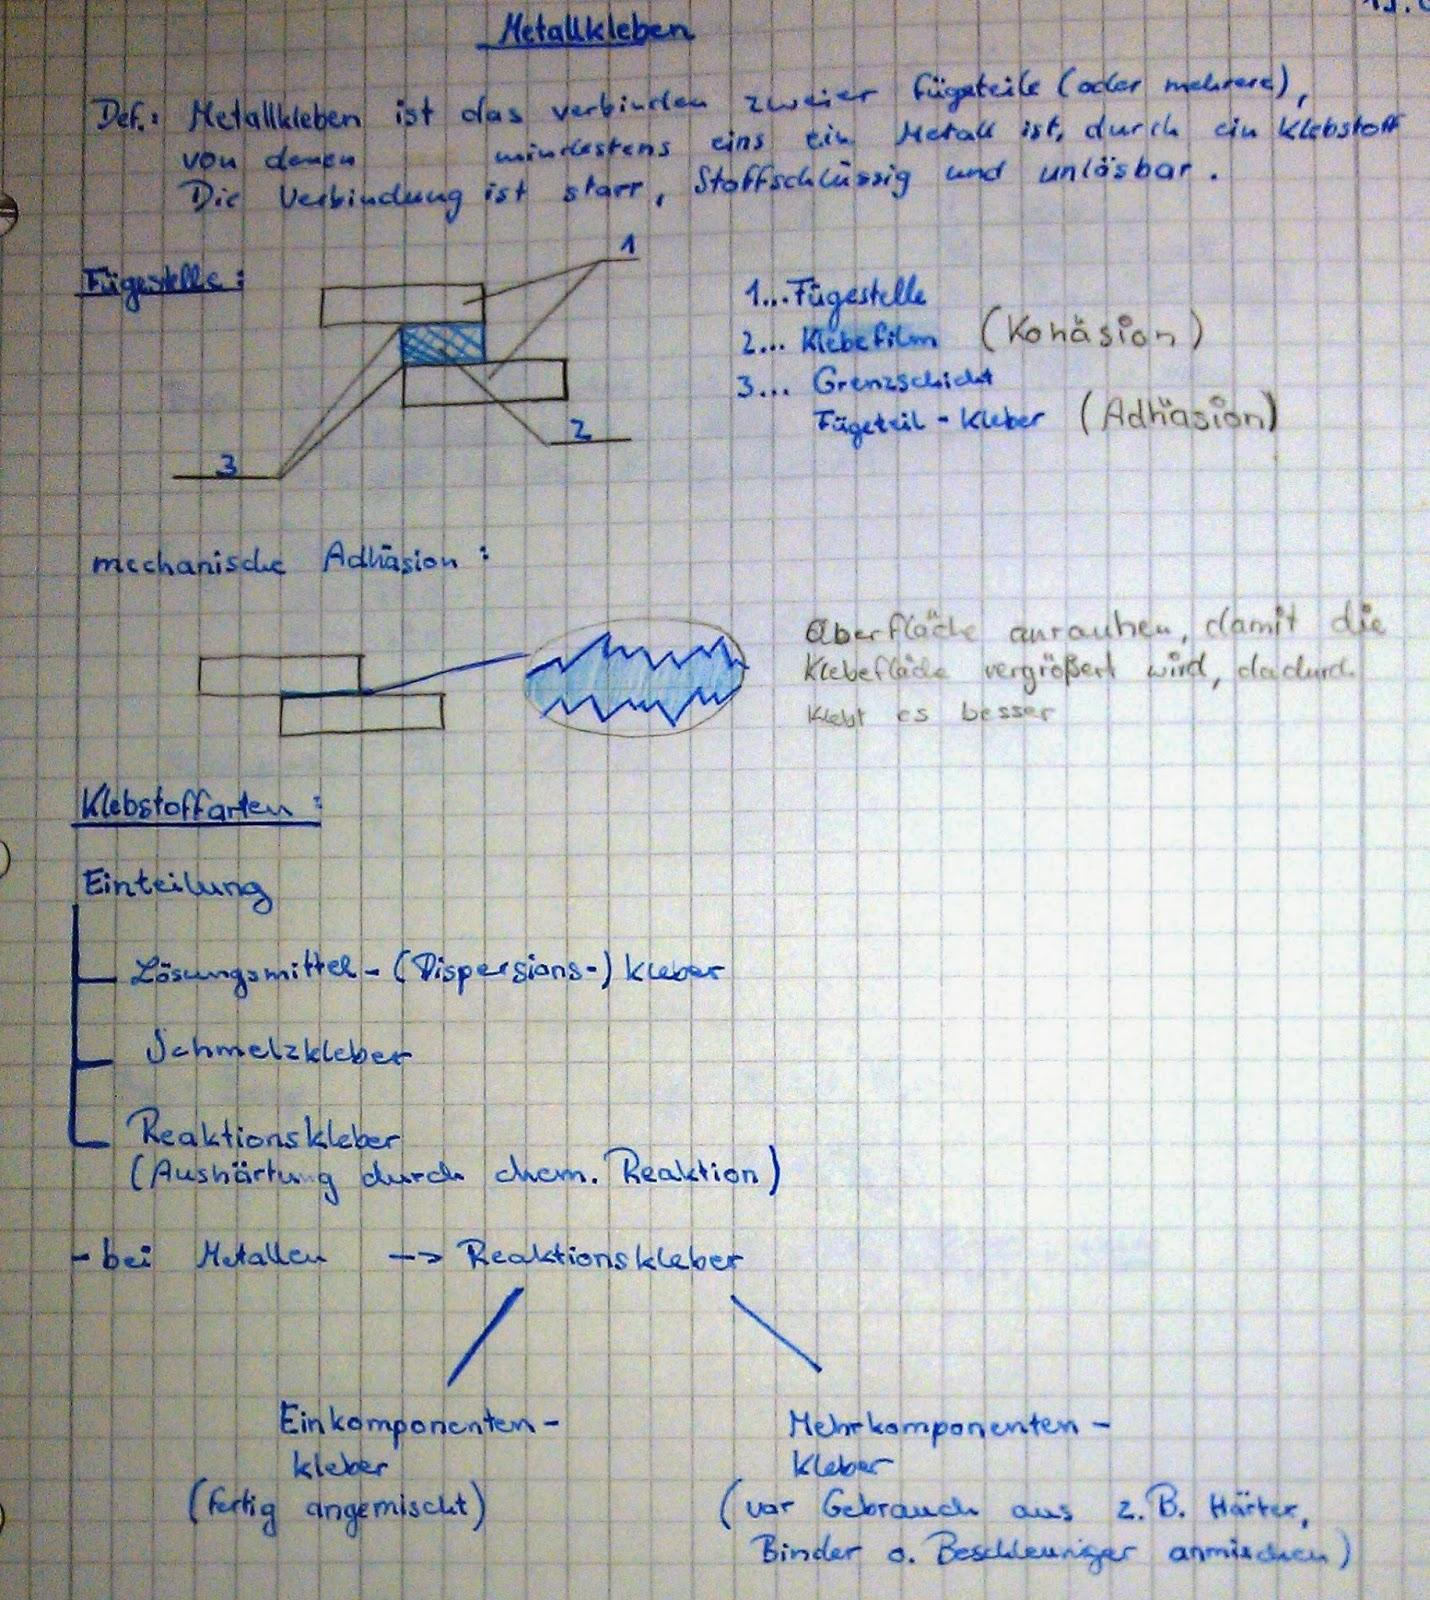 fachkundebuch metall pdf